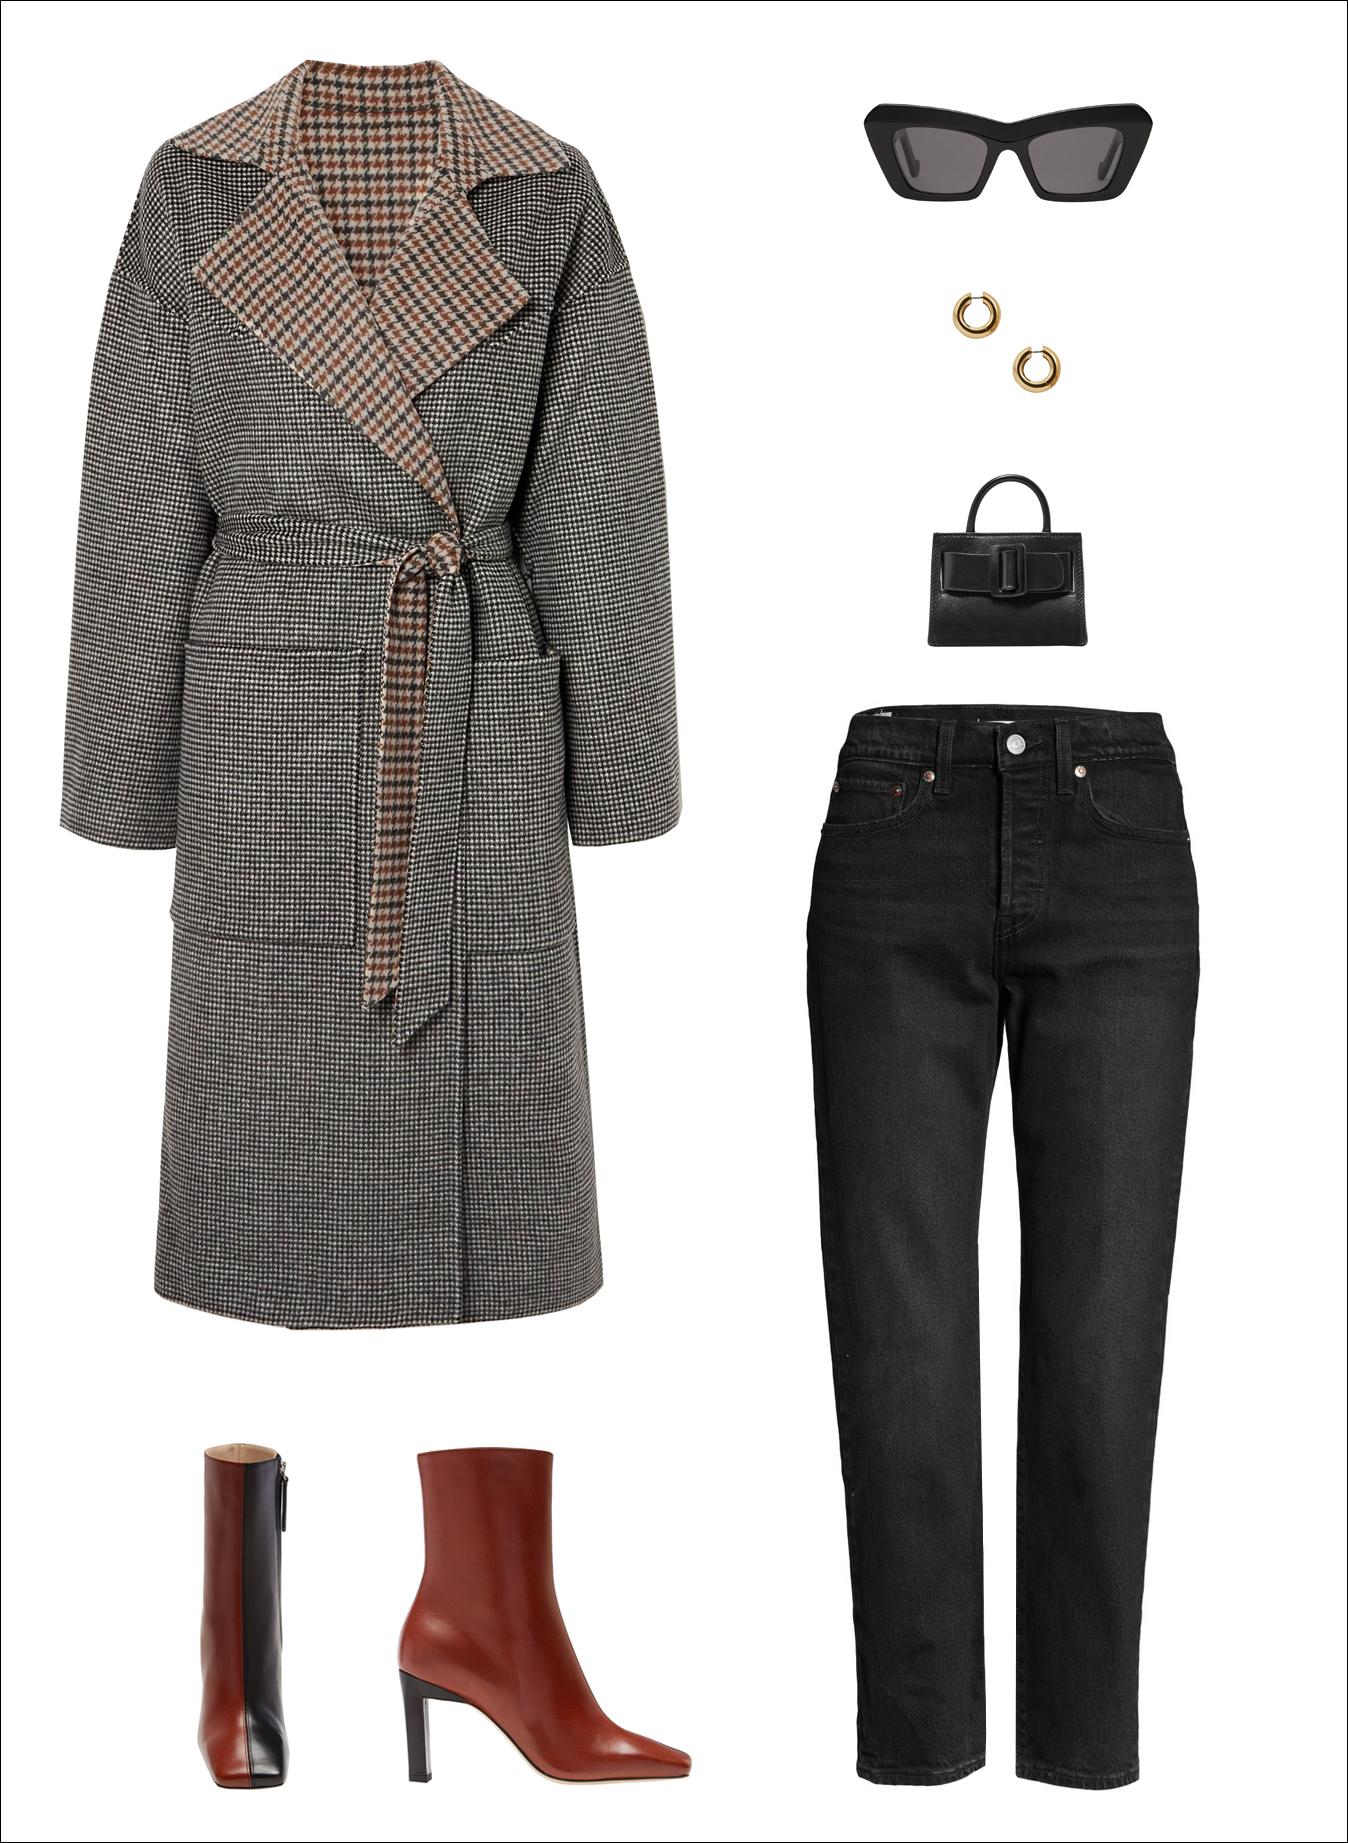 Winter Outfit Idea: Nanushka Alamo Reversible Statement Coat, Black Cat-Eye Sunglasses, Chunky Hoop Earrings, Boyy Mini Bag, Levi's Wedgie Black Jeans and Wadler Isa Two-Tone Sqaure-Toe Boots